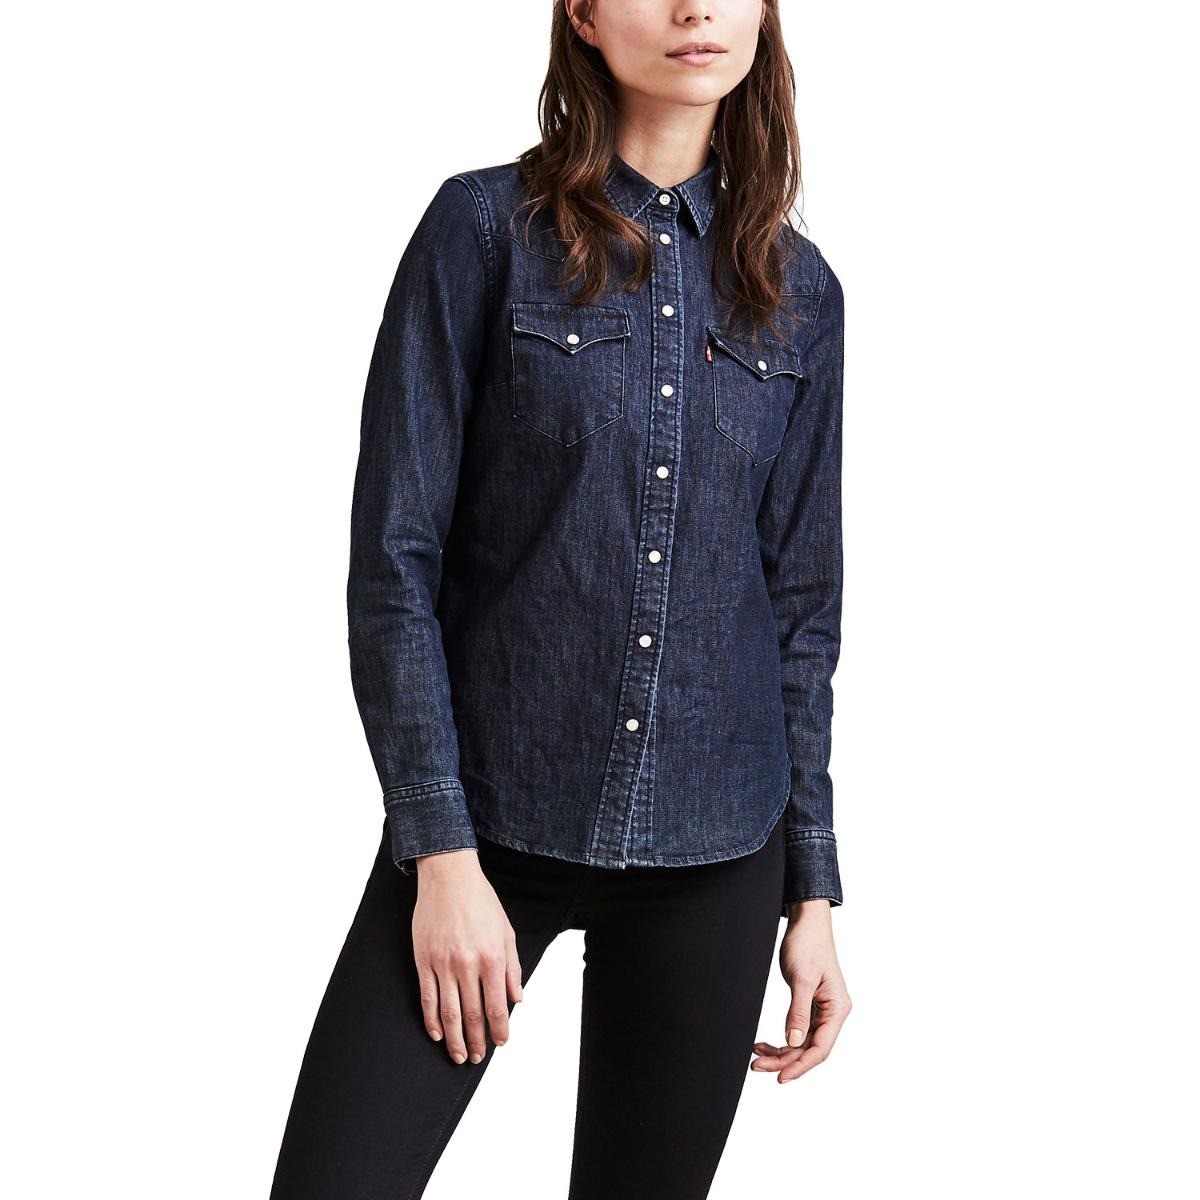 842792f77a camisa jeans levis tailored classic western lavagem escura. Carregando zoom.